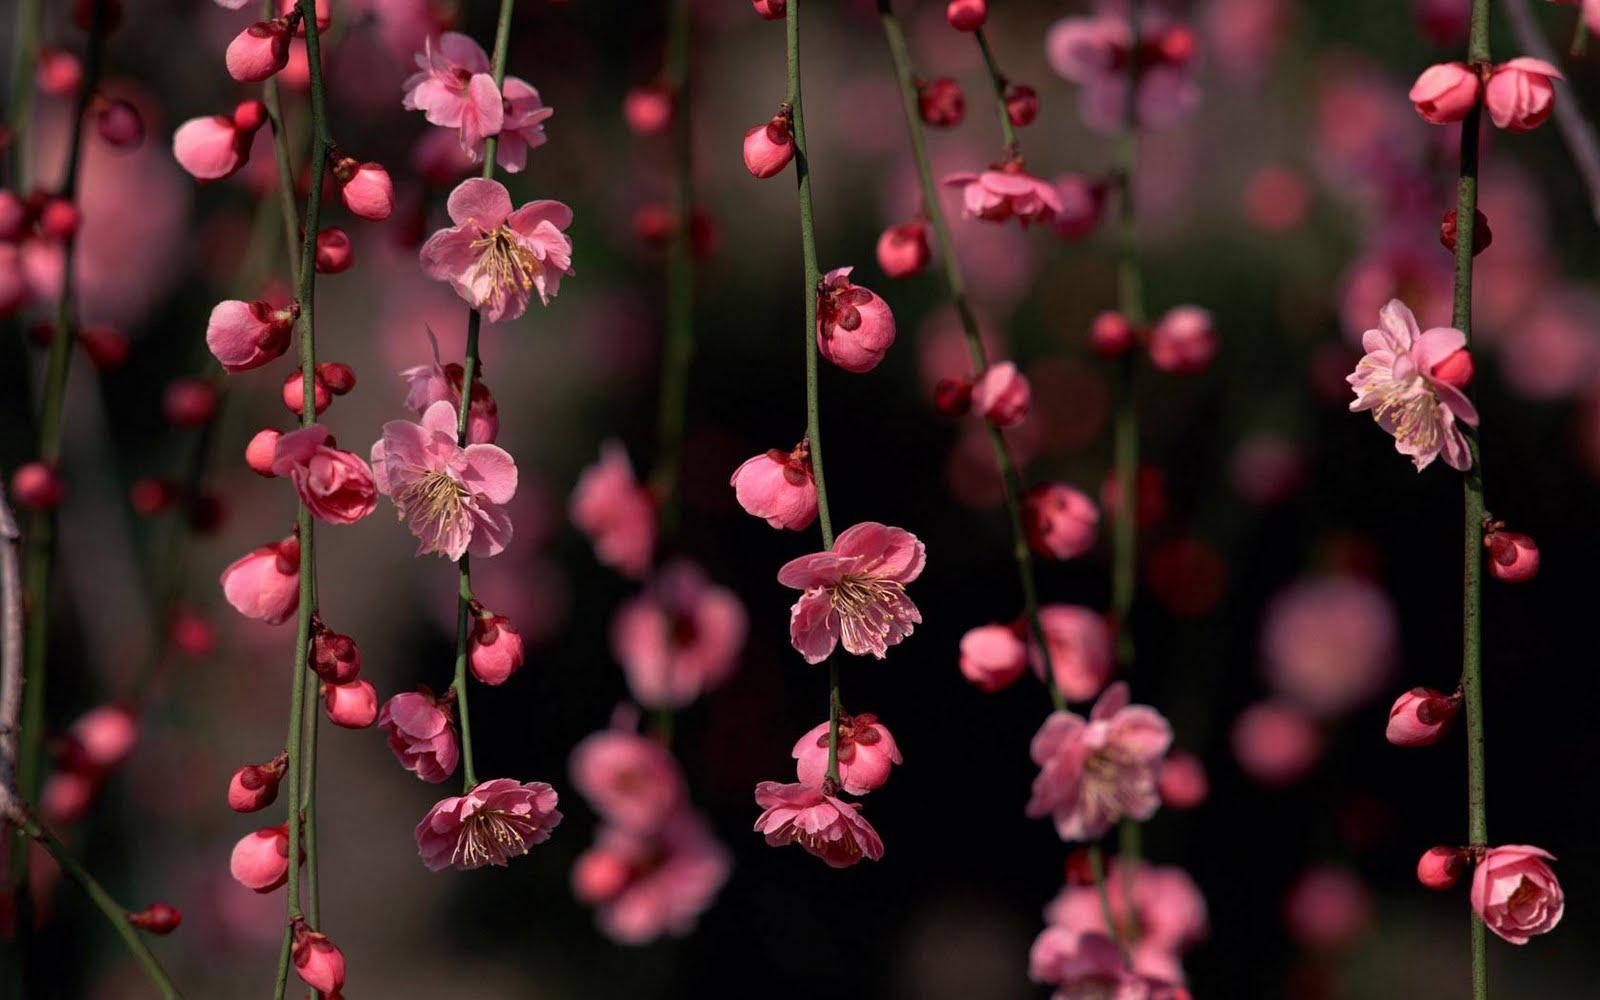 http://2.bp.blogspot.com/-iDL5eGiMlRk/TgY3QVupYeI/AAAAAAAAA4k/scfuCBcJtfE/s1600/Trees_Spring_flowers_hd_wallpaper.jpg